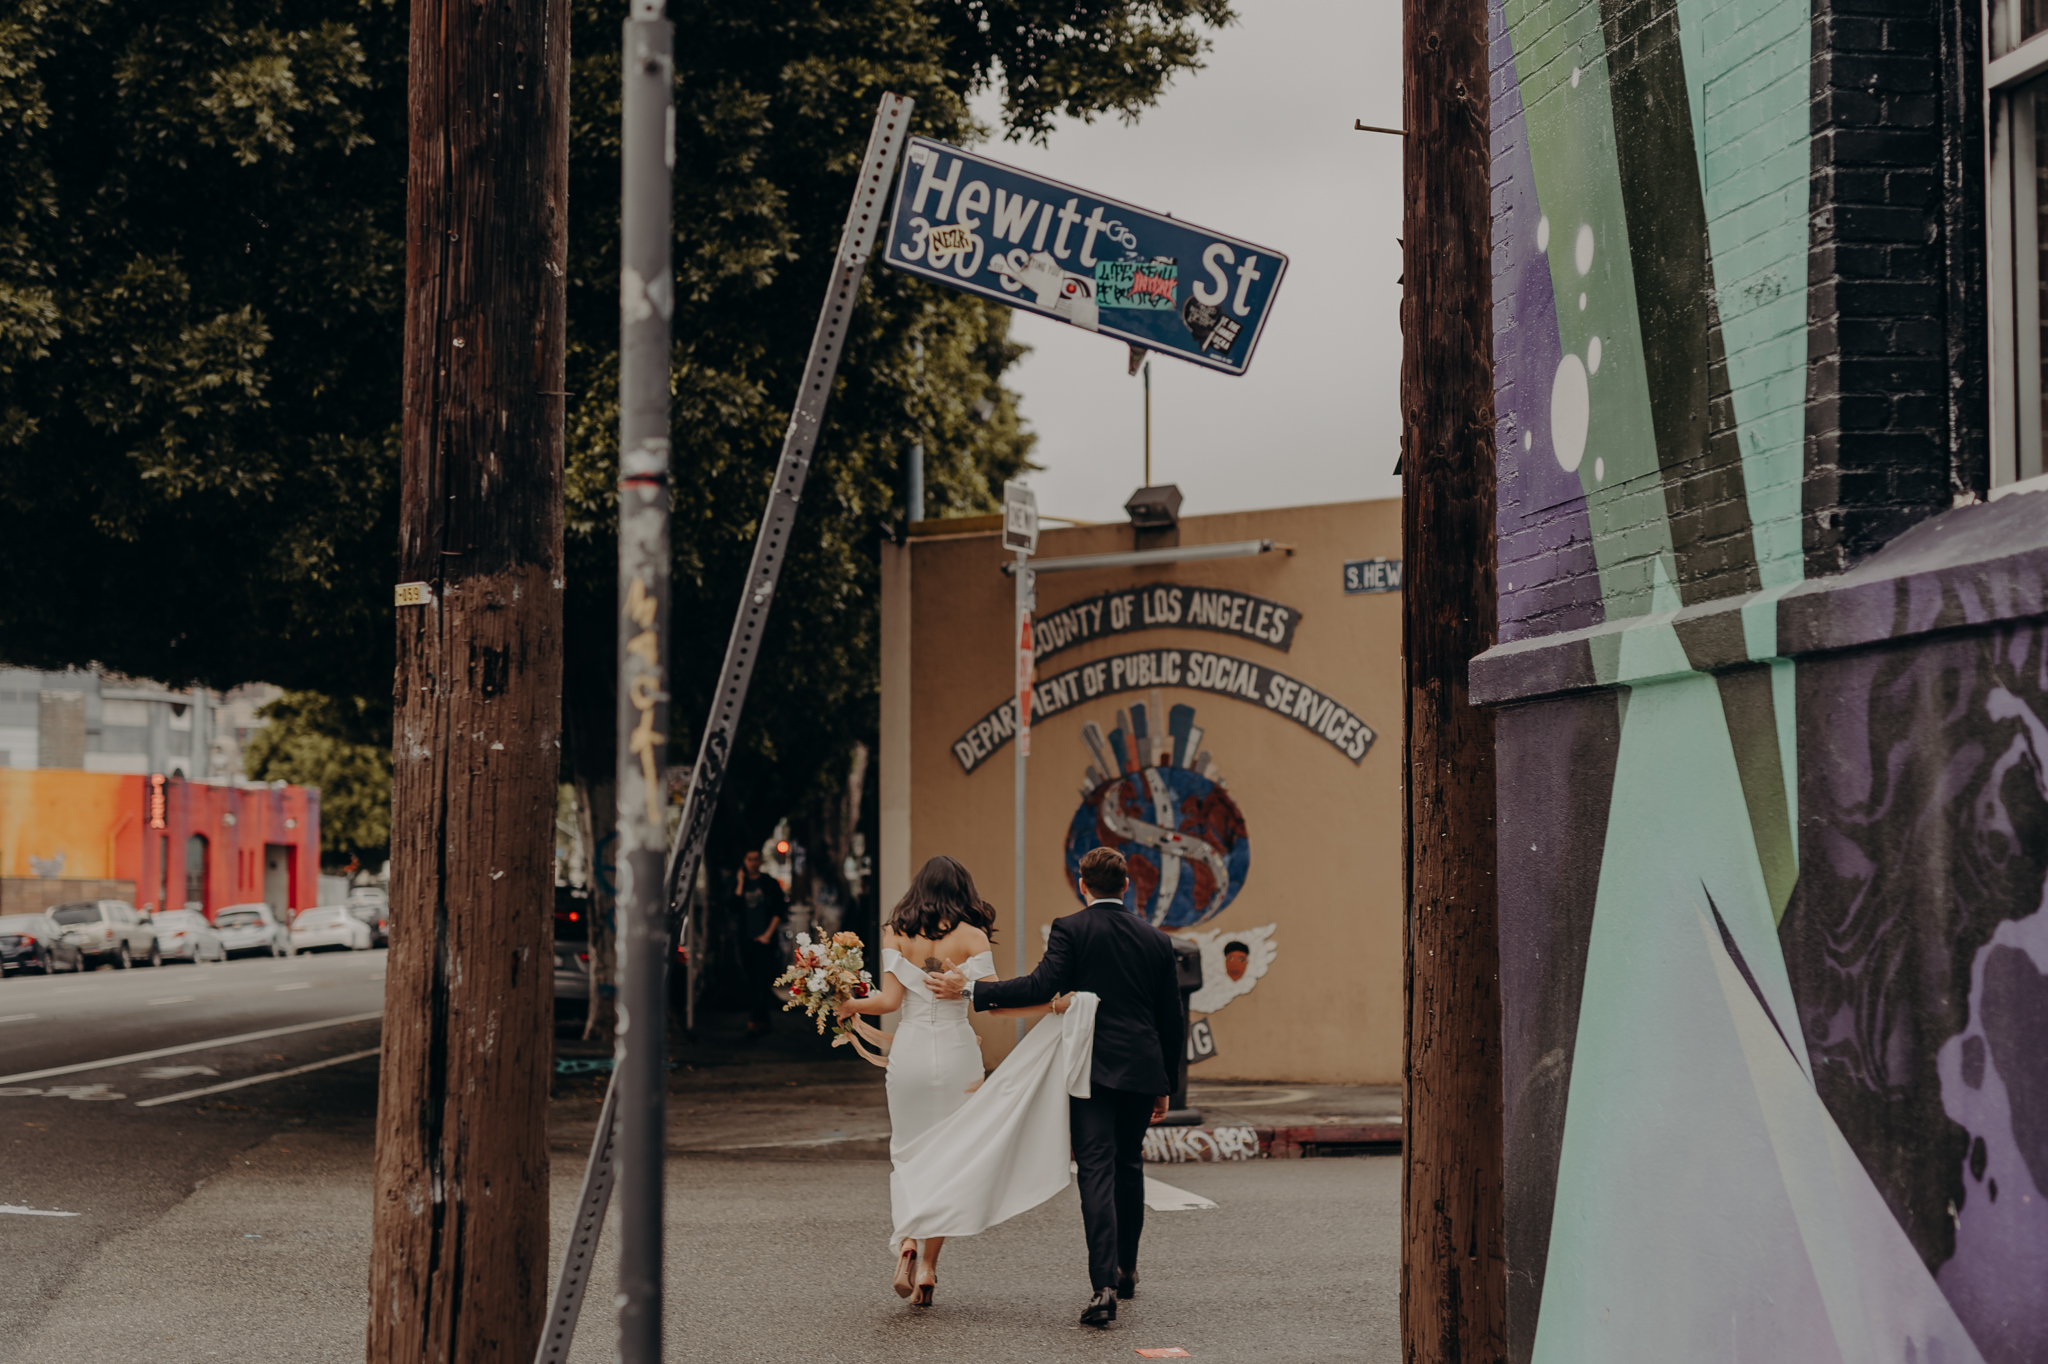 Wedding Photo LA - wedding photographer in los angeles - millwick wedding venue -isaiahandtaylor.com-069.jpg